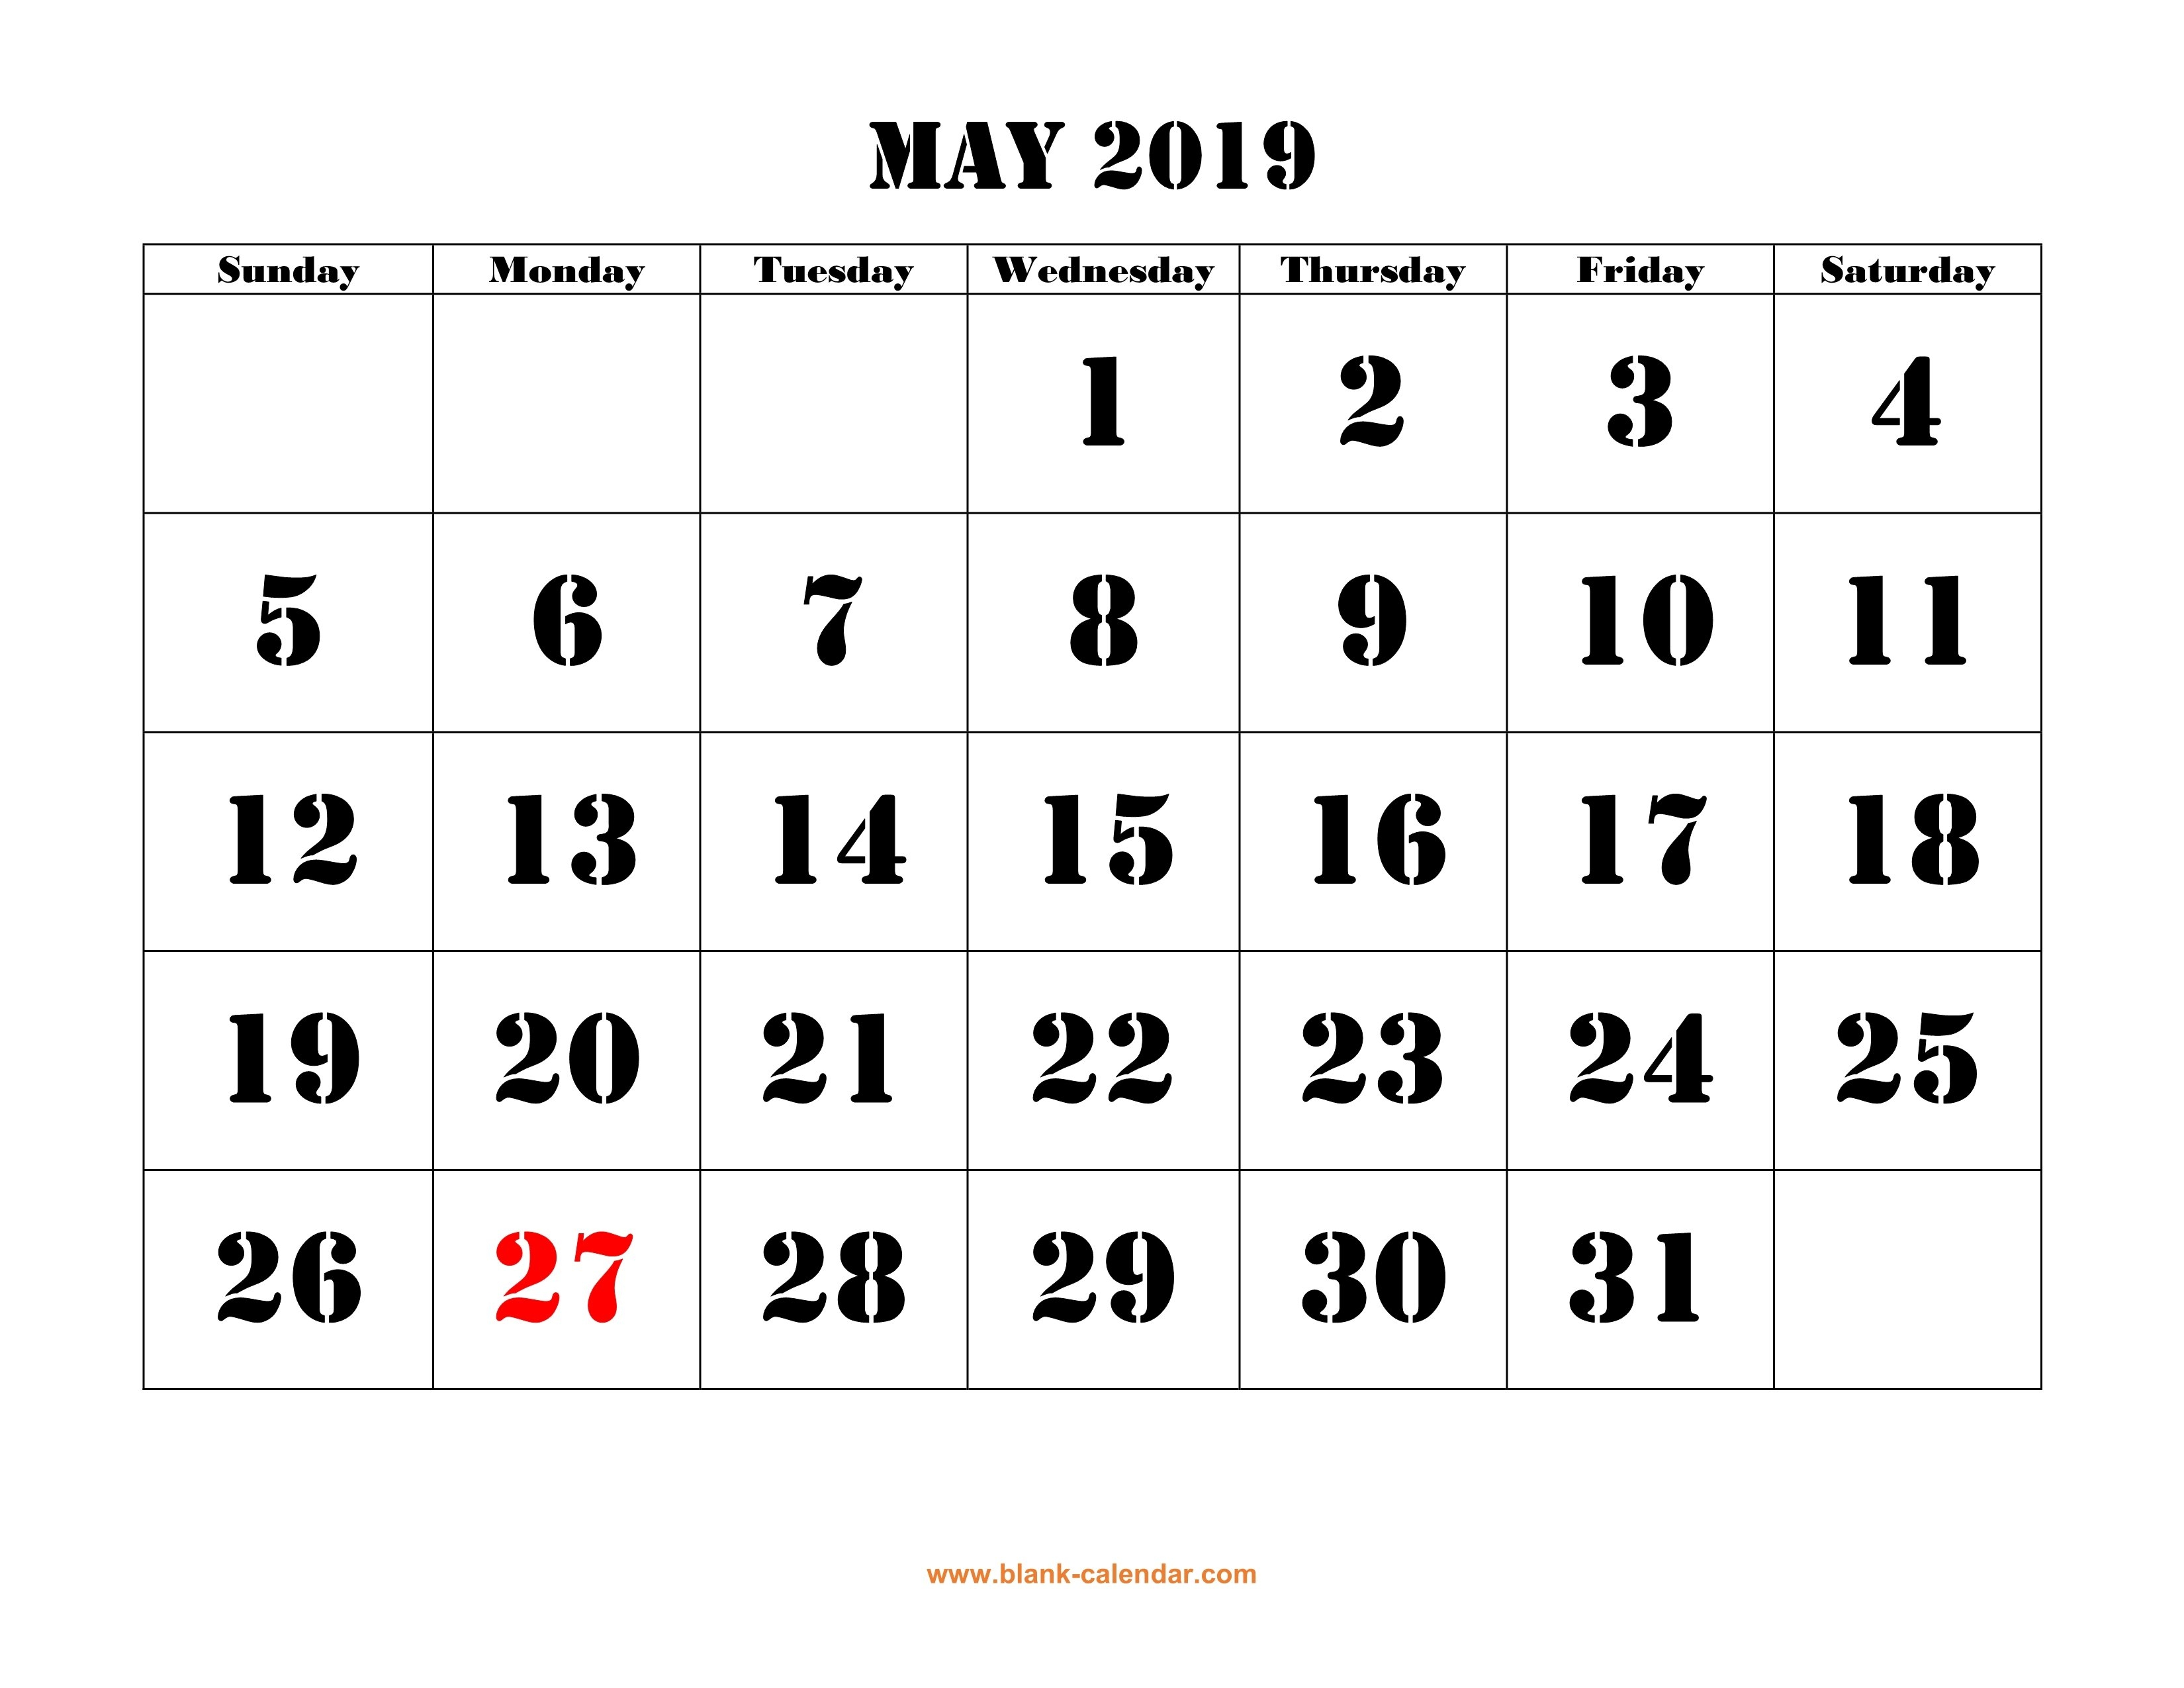 Free Download Printable May 2019 Calendar, Large Font Design Calendar May 3 2019